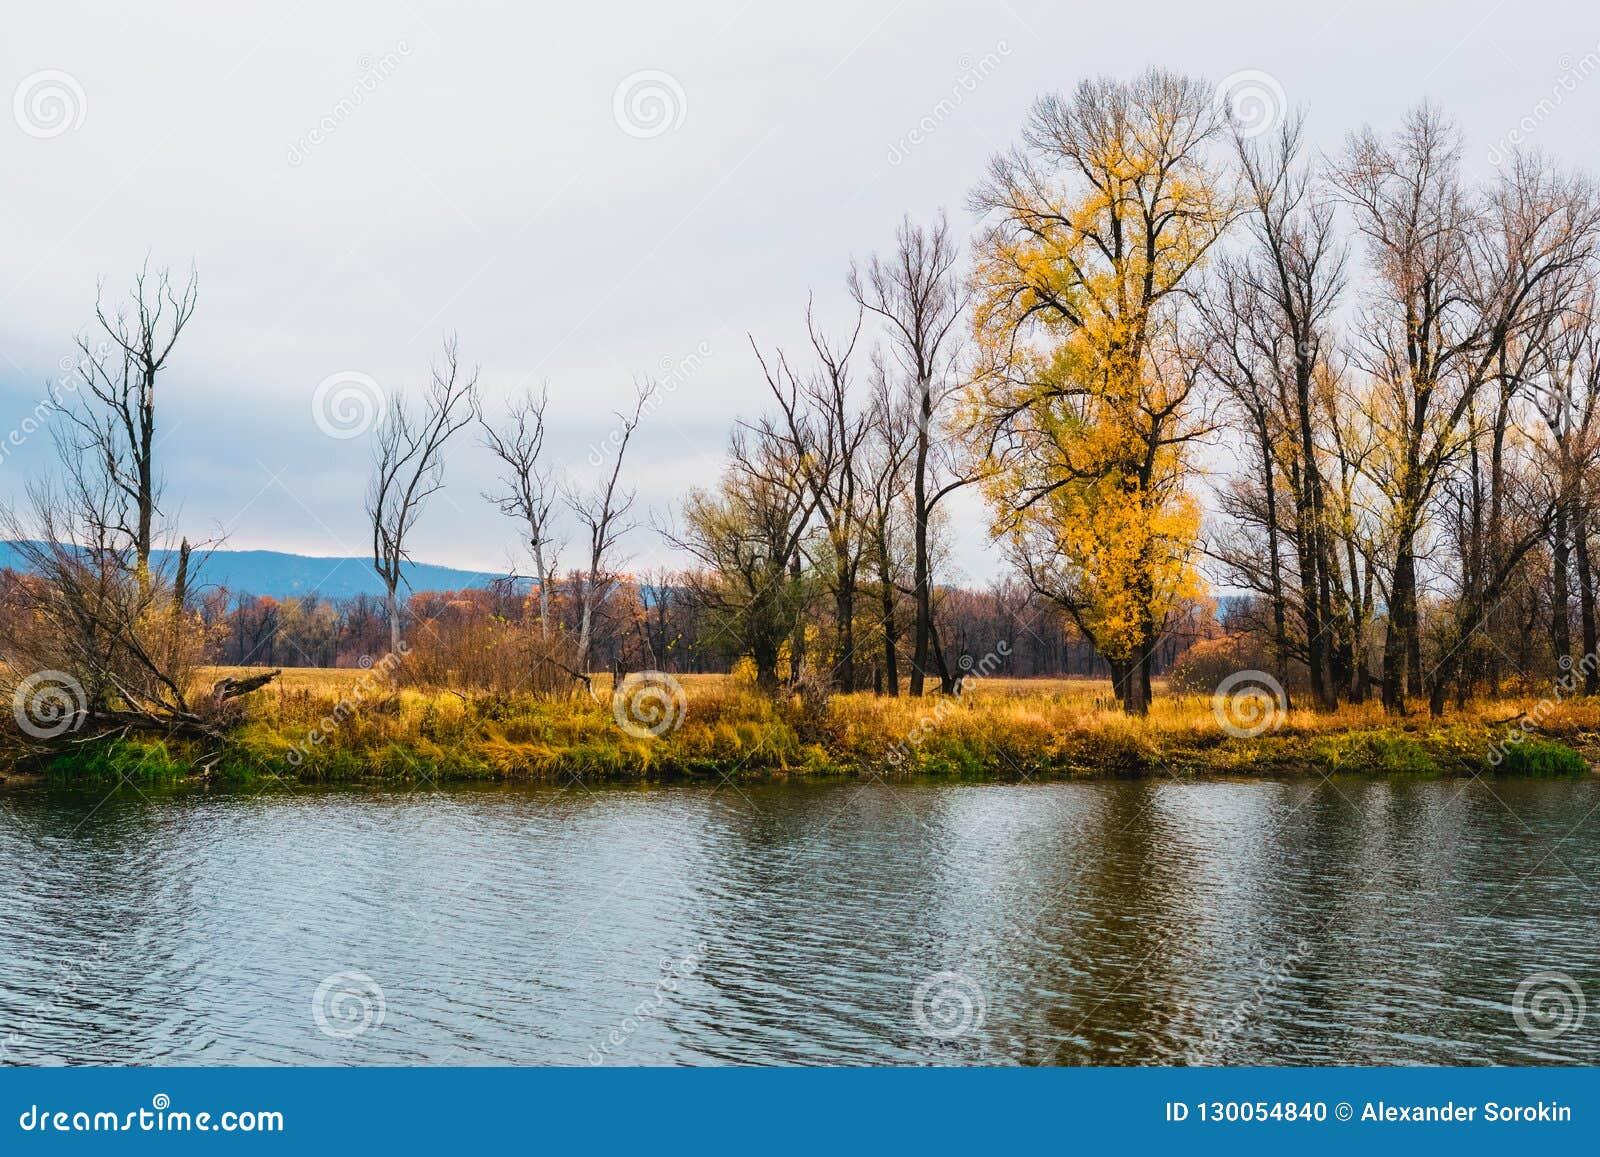 Floodplain meadows of forest-steppe zone